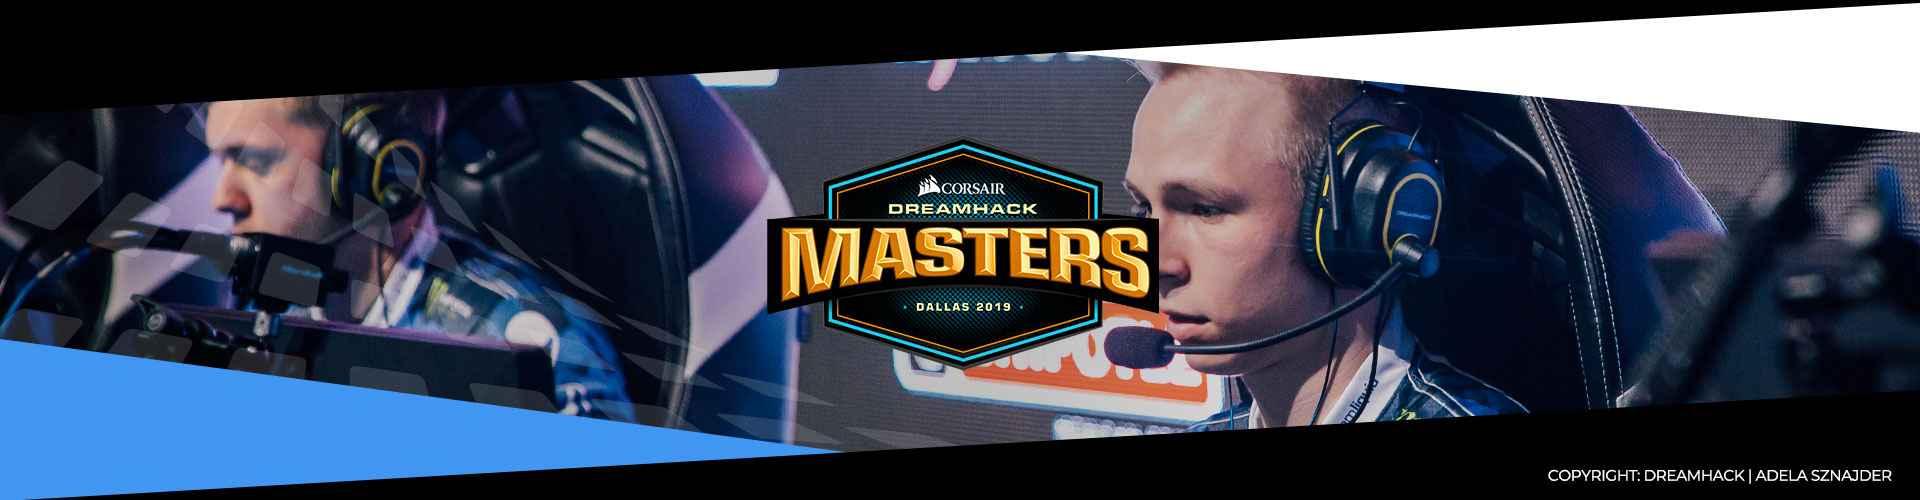 Dreamhack Masters Dallas 2. päivän yhteenveto